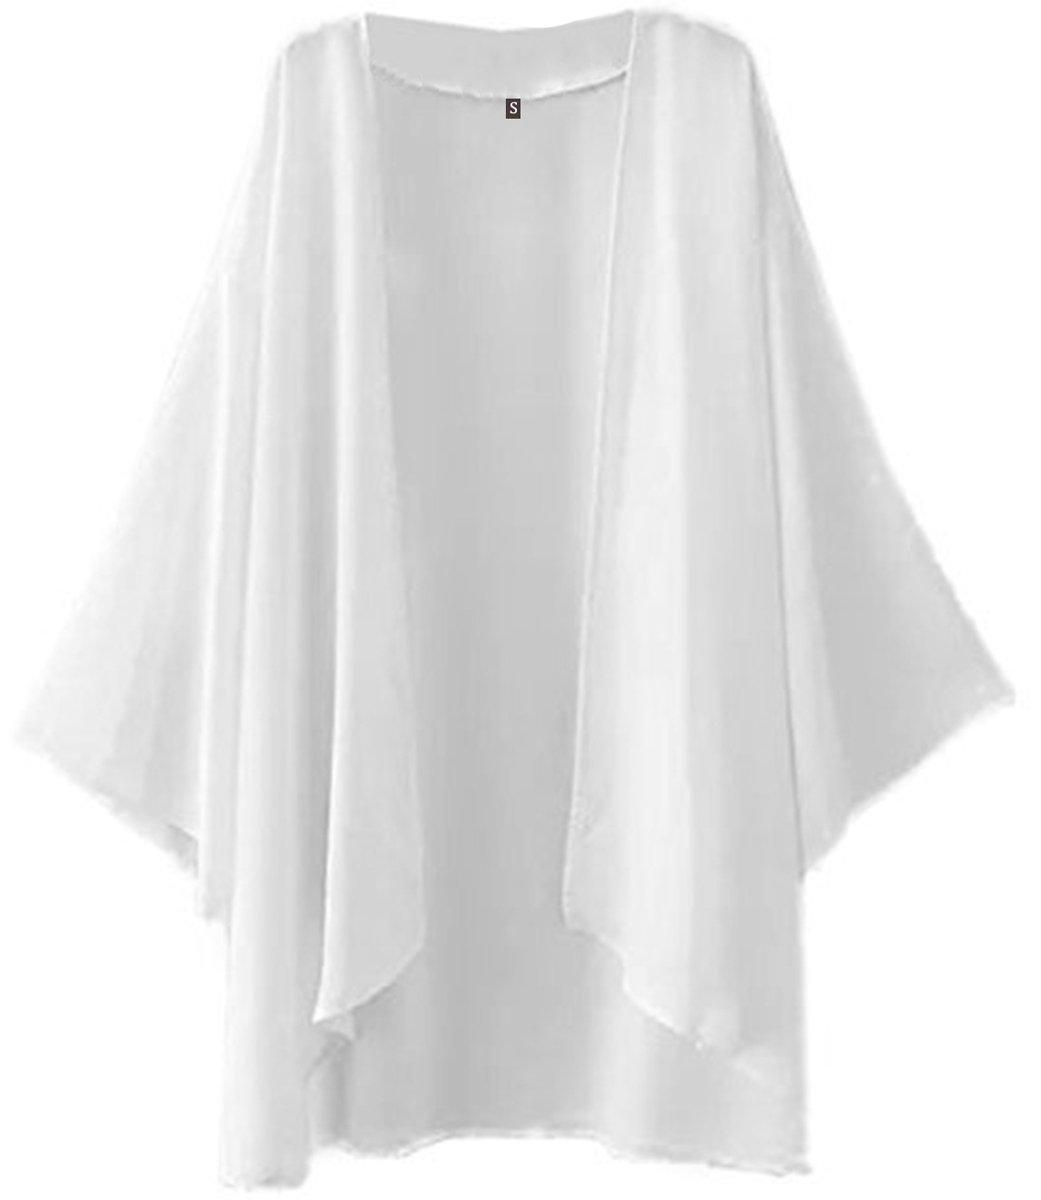 NEW-EC Swimsuits Cover Ups for Girls Women Tops Plus Size White Sheer Chiffon Jacket Kimono Cardigan 3/4 Sleeve L Beach Wear Summer Travel Essentials